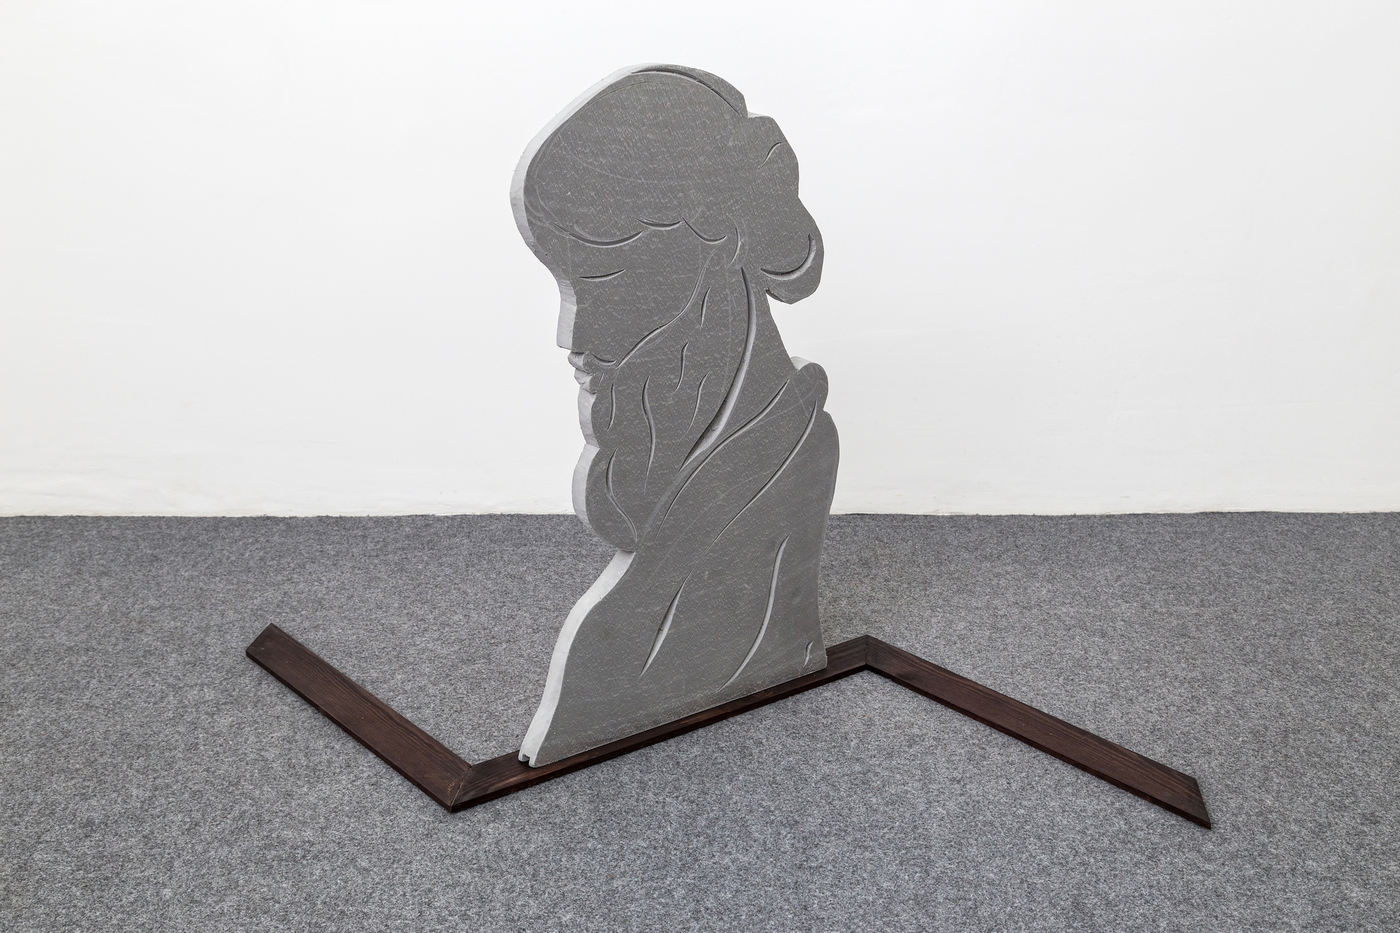 Grant Foster The Meta Leader 78x70x120 cm wood foam 2016